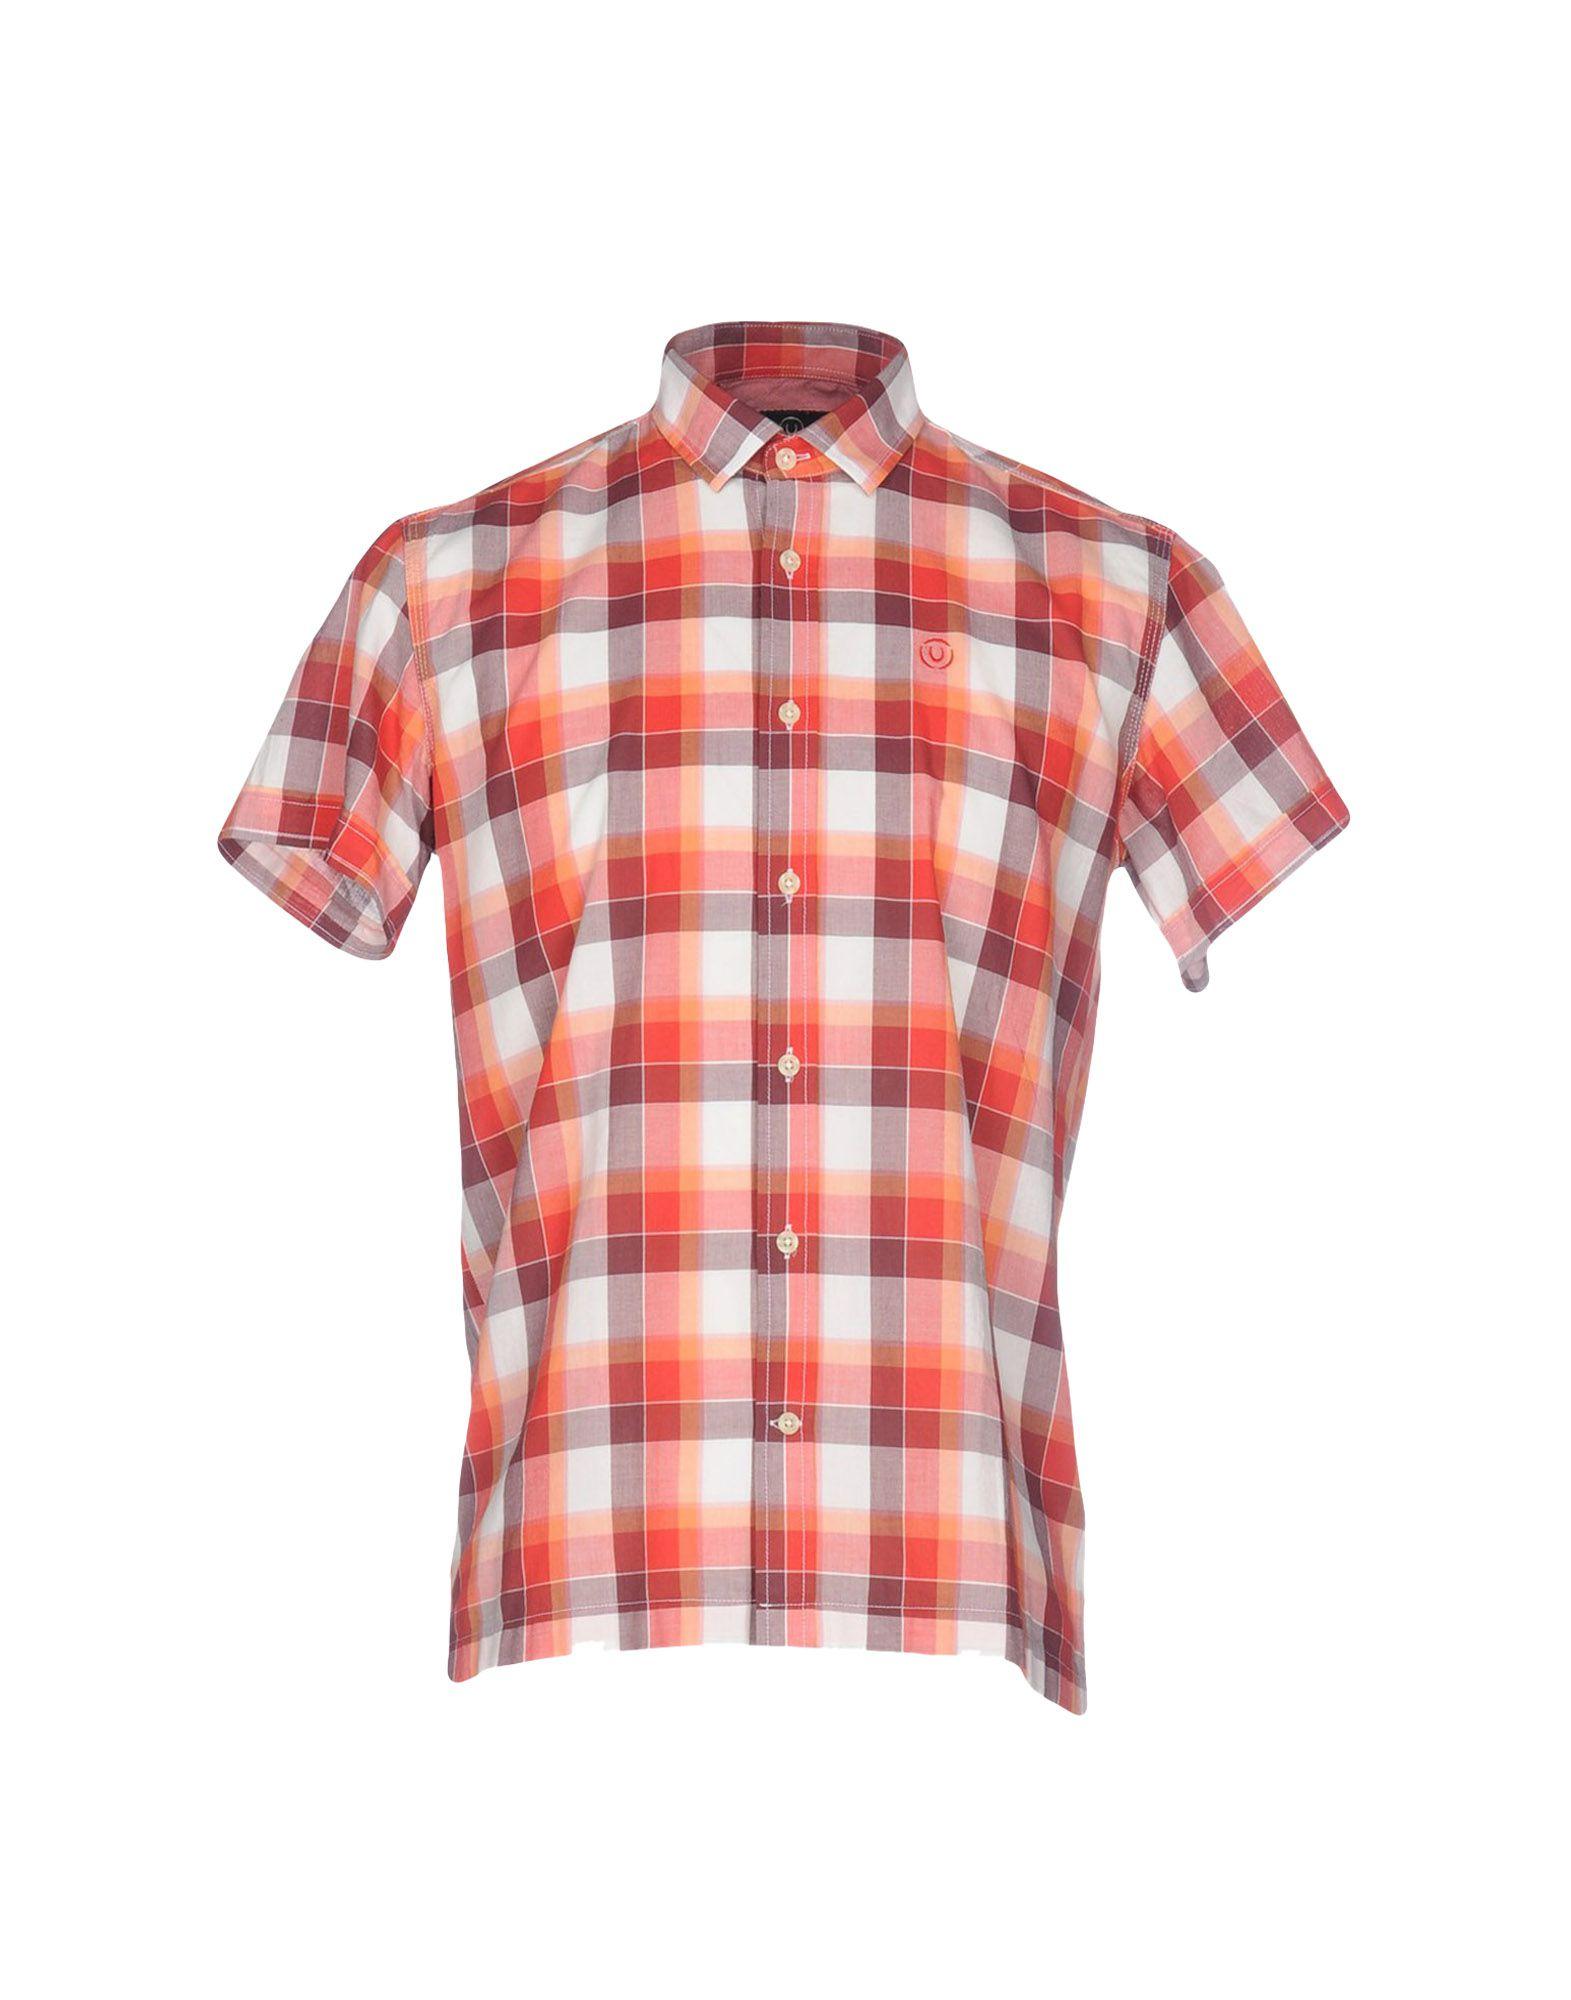 цена  DUCK AND COVER Pубашка  онлайн в 2017 году